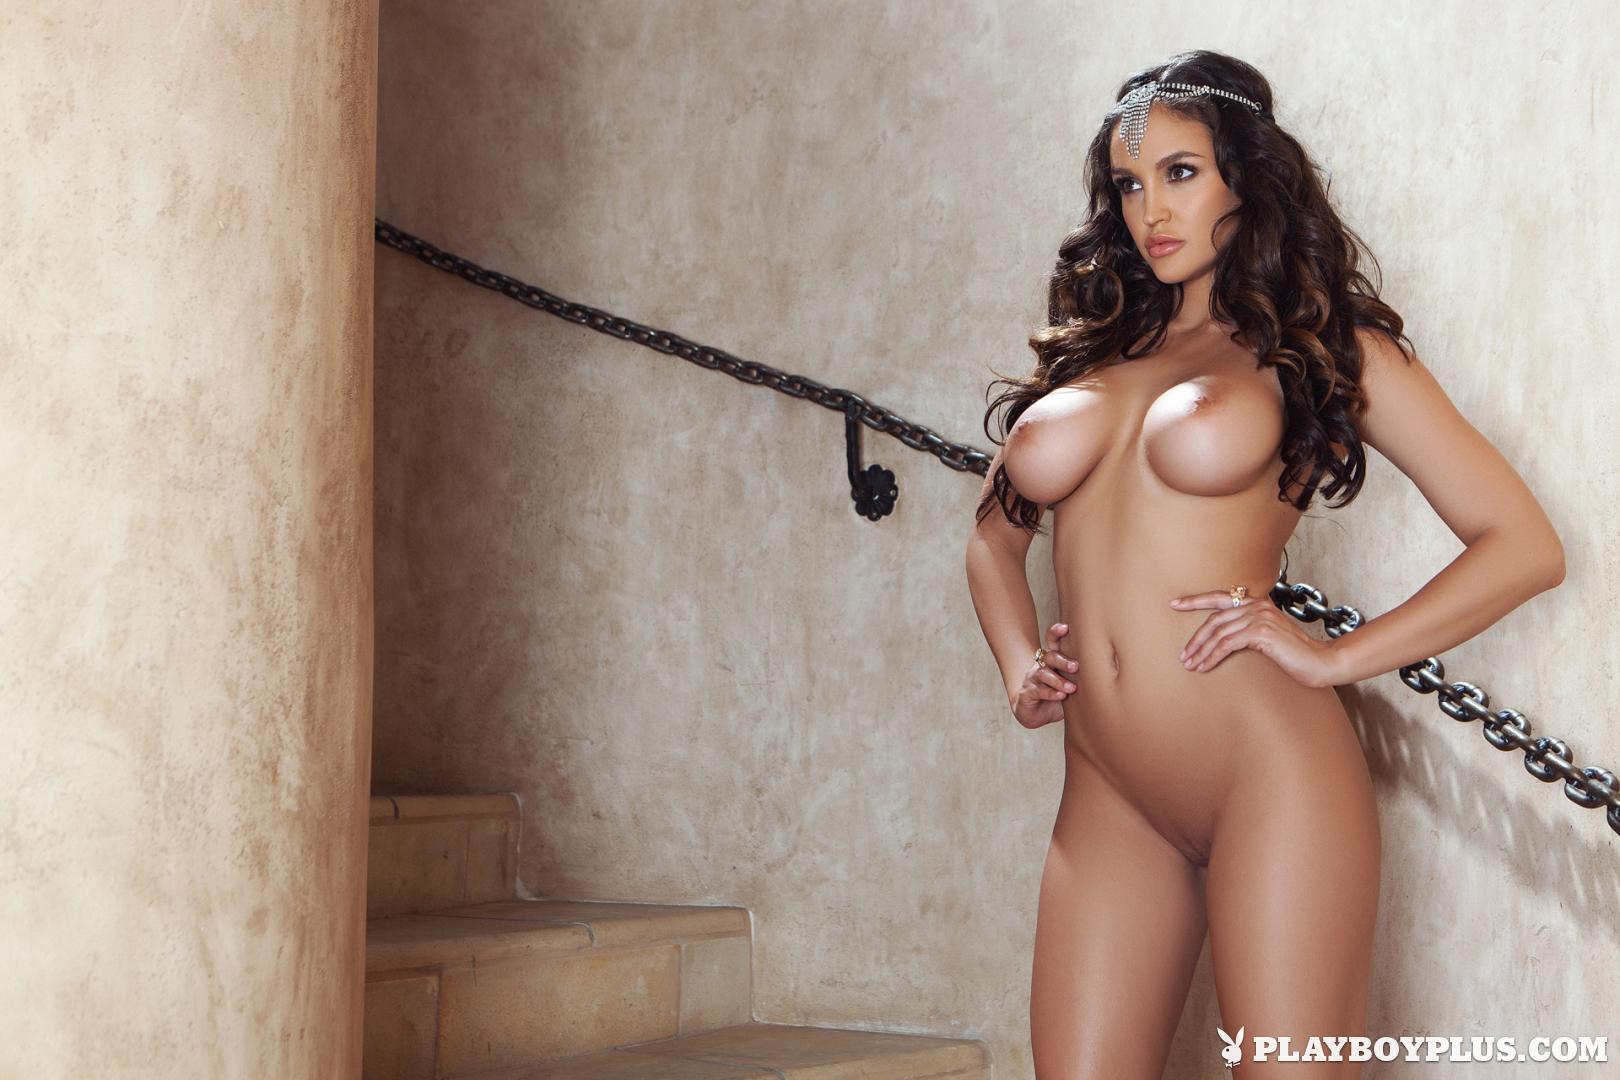 jaclyn swedberg in sweet retreatplayboy plus (12 nude photos